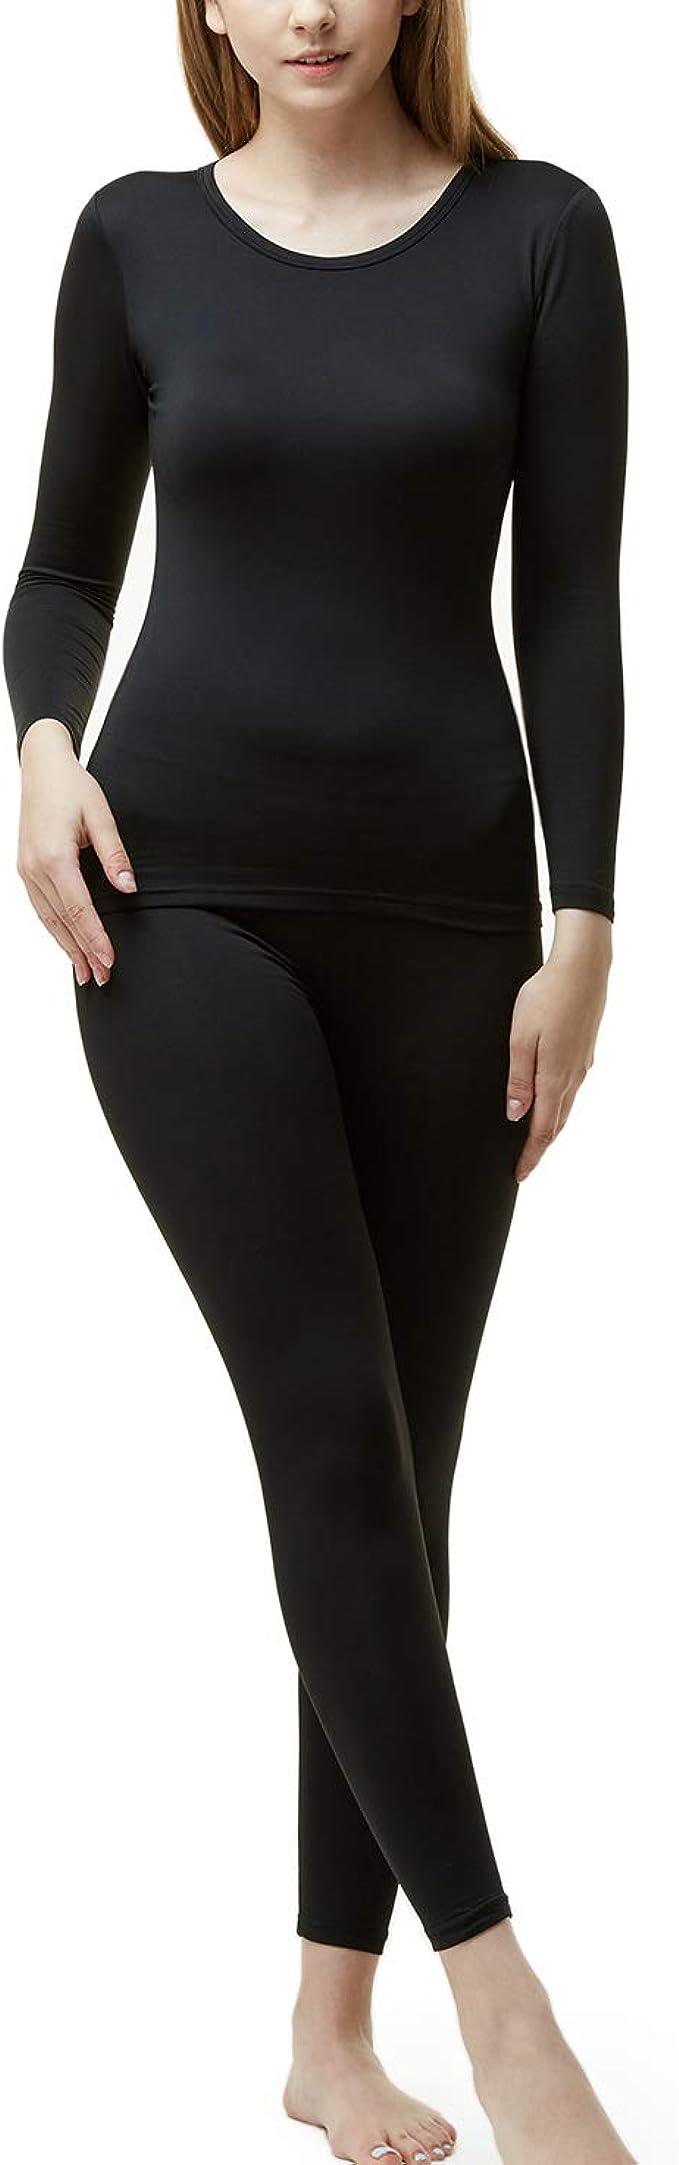 Winter Warm Base Layer Top /& Bottom TSLA Mens Thermal Underwear Set Microfiber Soft Fleece Lined Long Johns